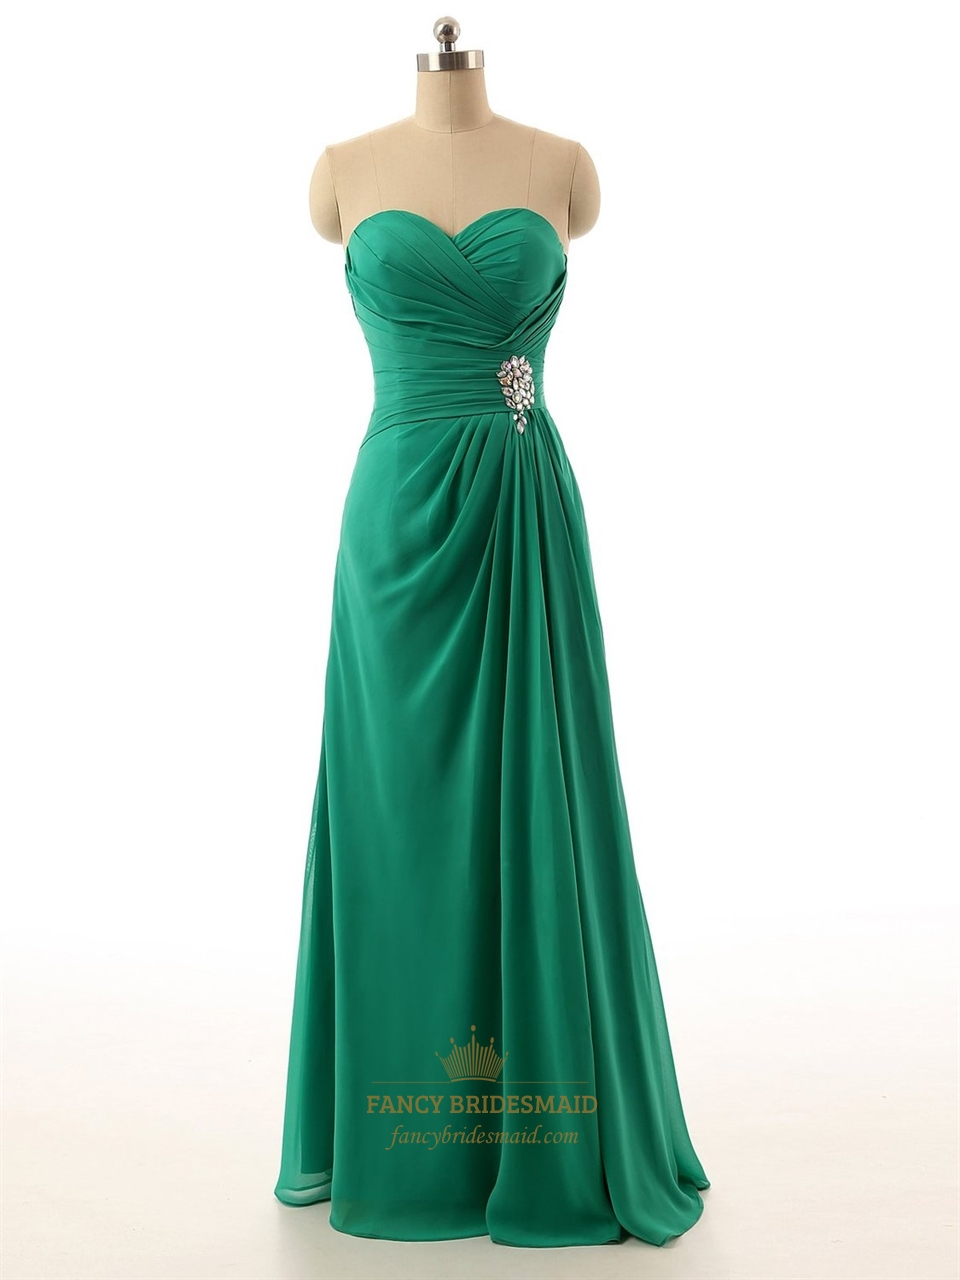 Emerald Green Strapless Sweetheart Neckline Chiffon